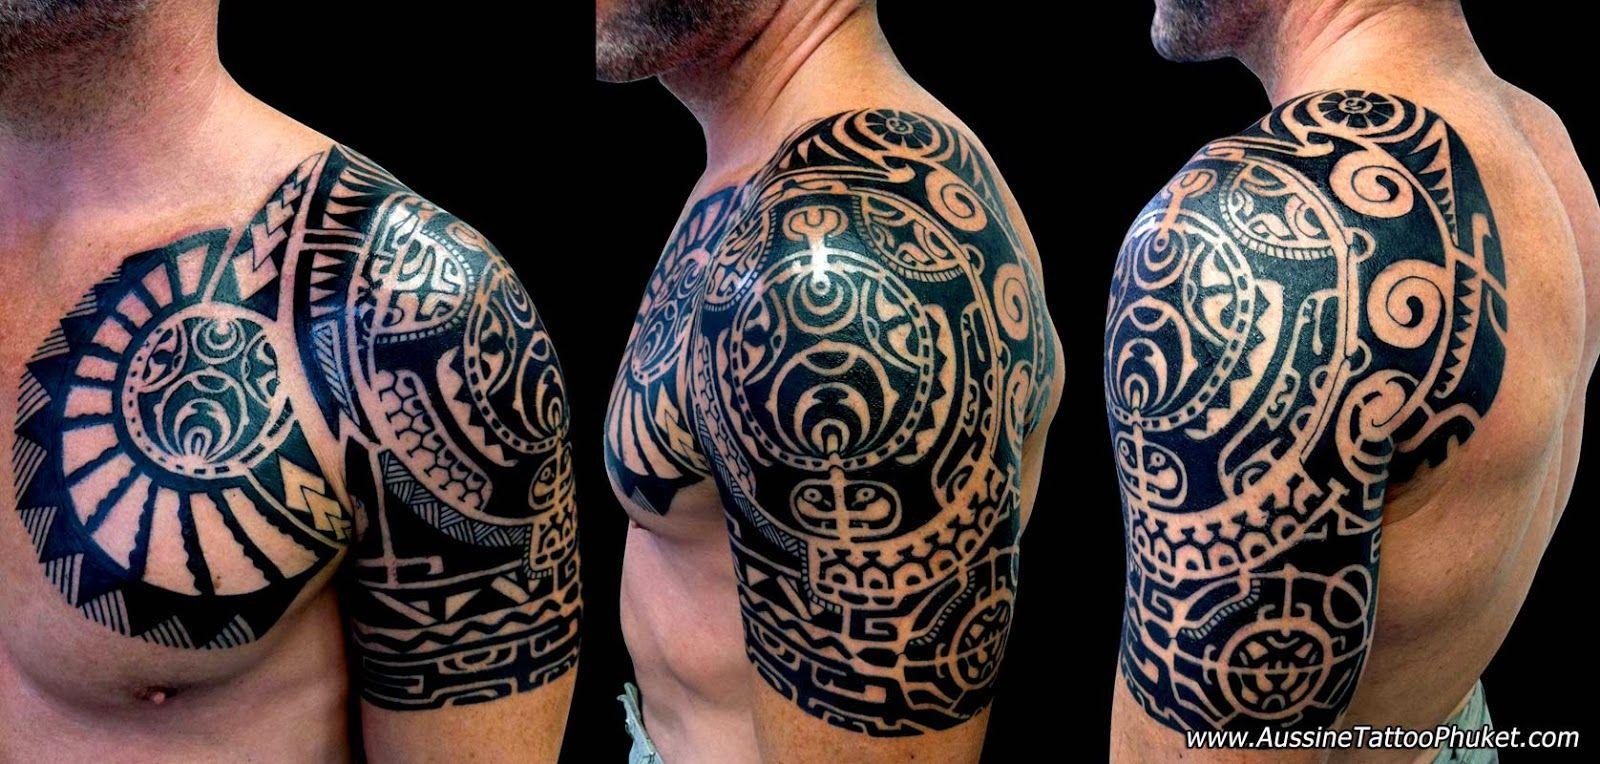 3d celtic tattoo h ada googlom tattoo pinterest celtic tattoos and tattoo. Black Bedroom Furniture Sets. Home Design Ideas